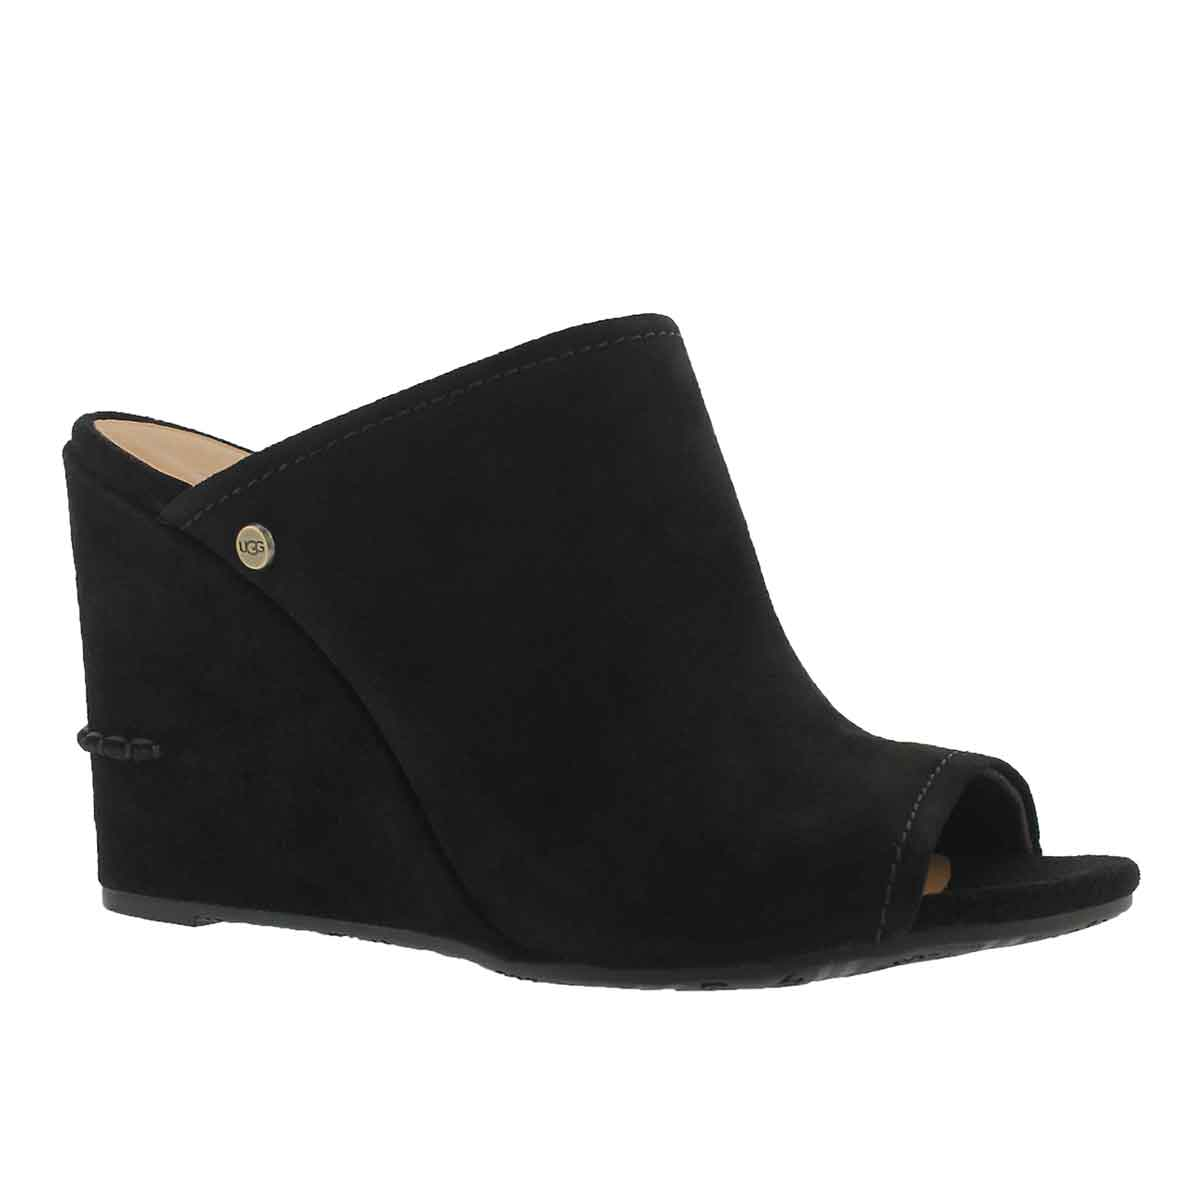 Lds Lively black wedge slide sandal